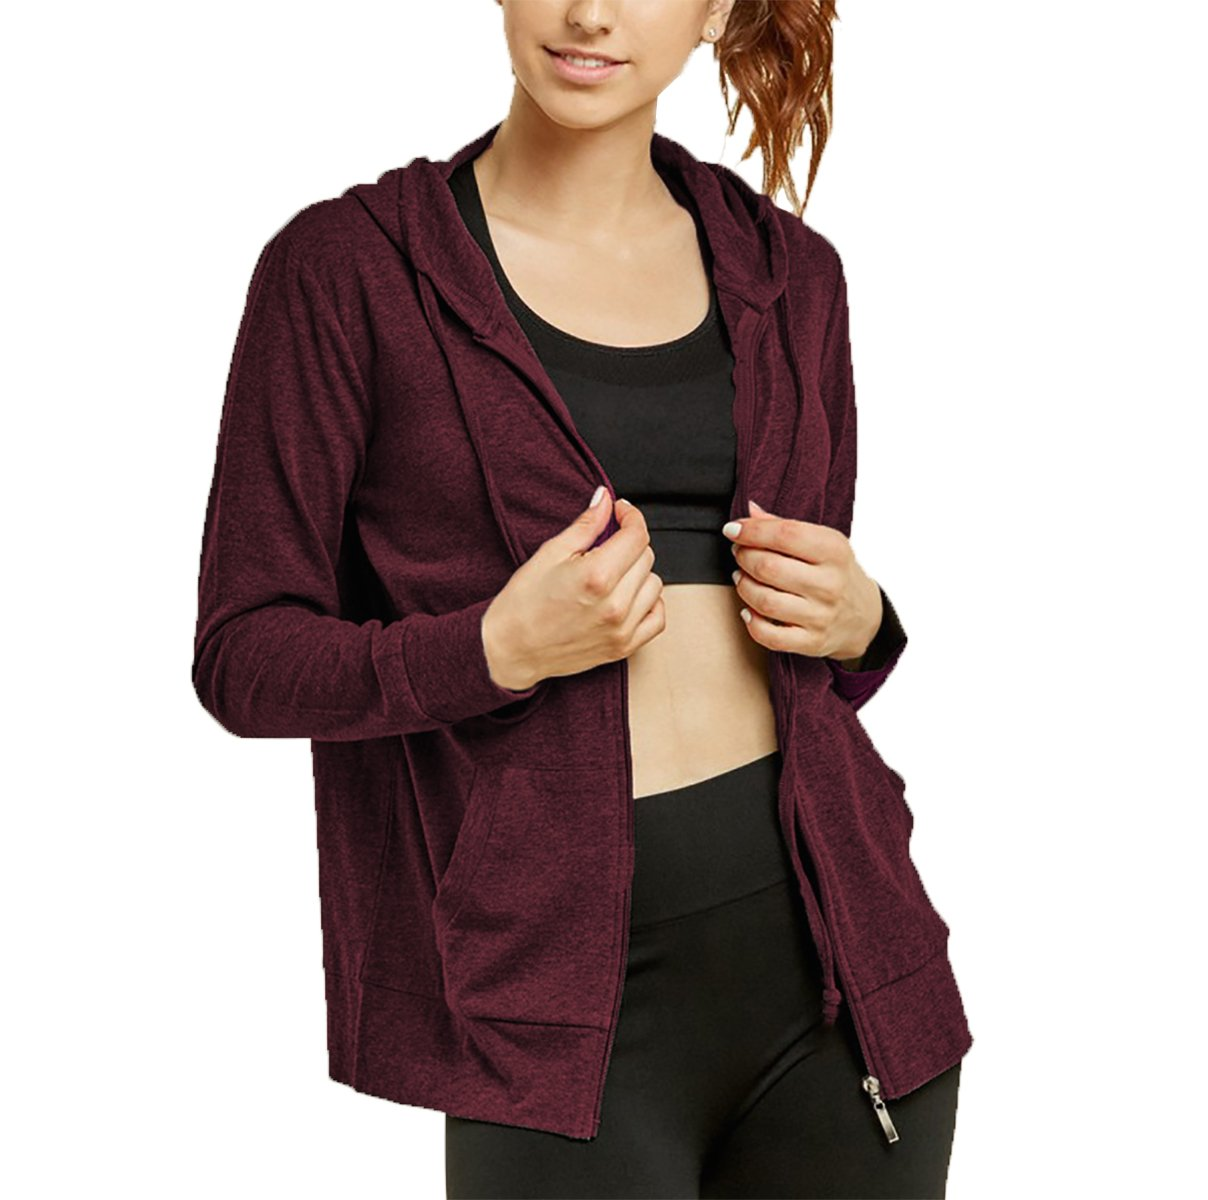 Glass House Apparel Women's Zip up Active Yoga Gym Casual Thin Cotton Long Sleeve Jacket Hoodie (Burgundy, Medium)